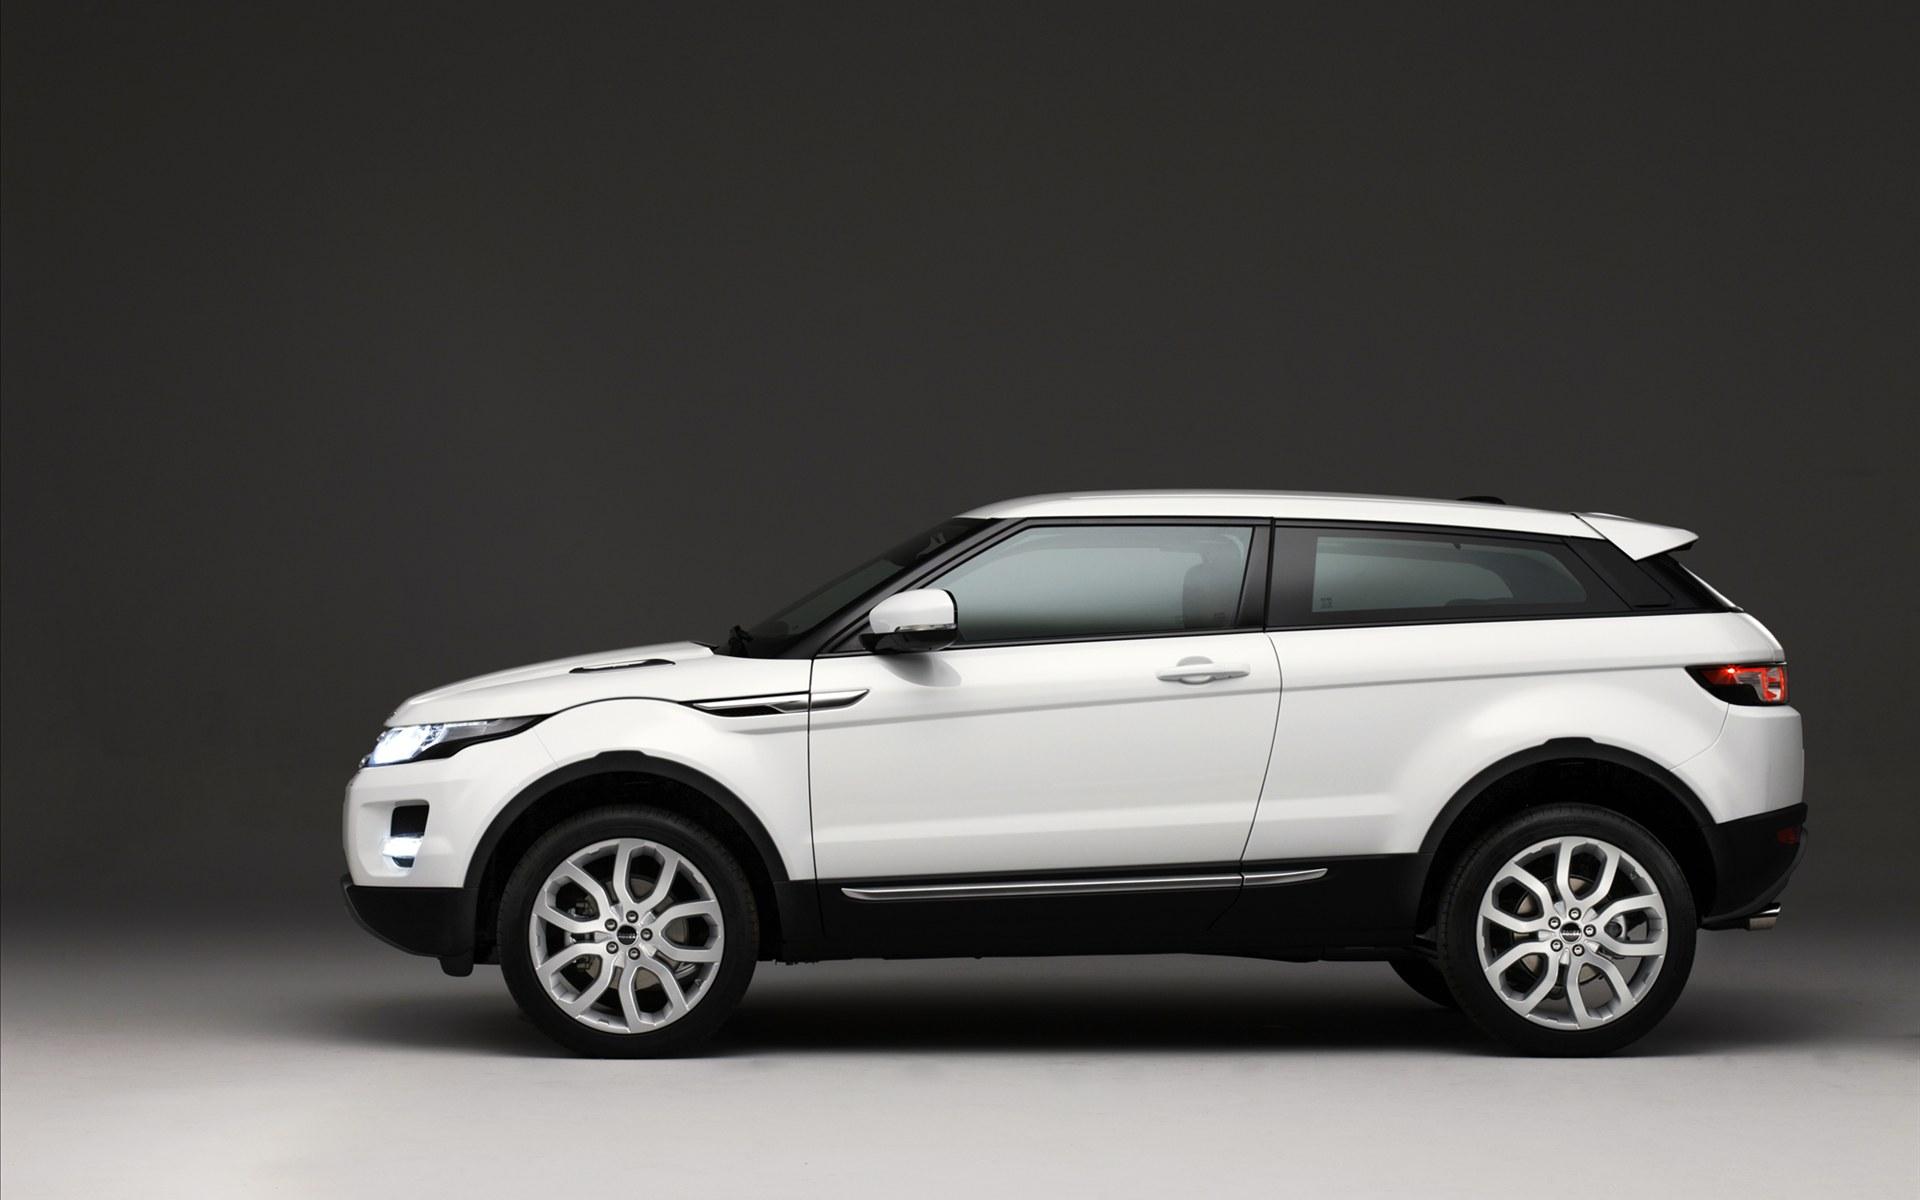 2011 land rover dc100 concept side 2 1280x960 wallpaper - Land Rover Evoque Wallpapers